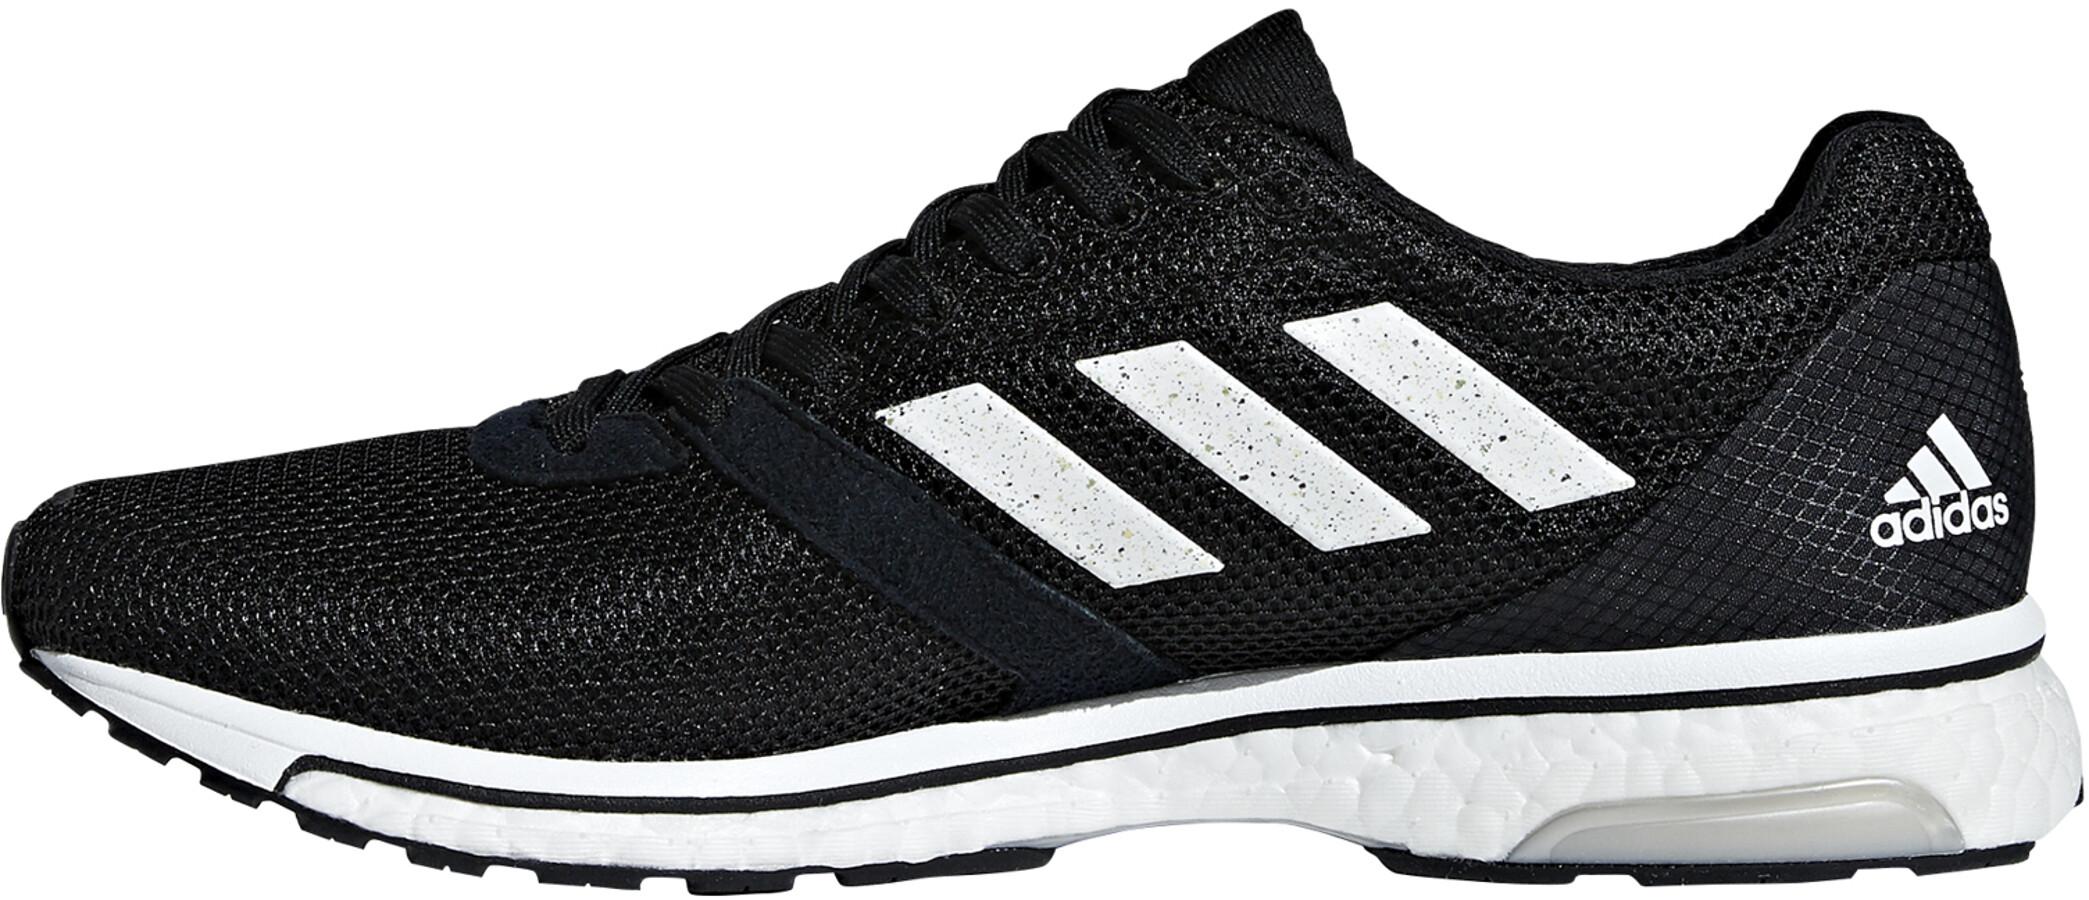 sports shoes e605e 7c9b7 adidas Adizero Adios 4 Løbesko Herrer sort